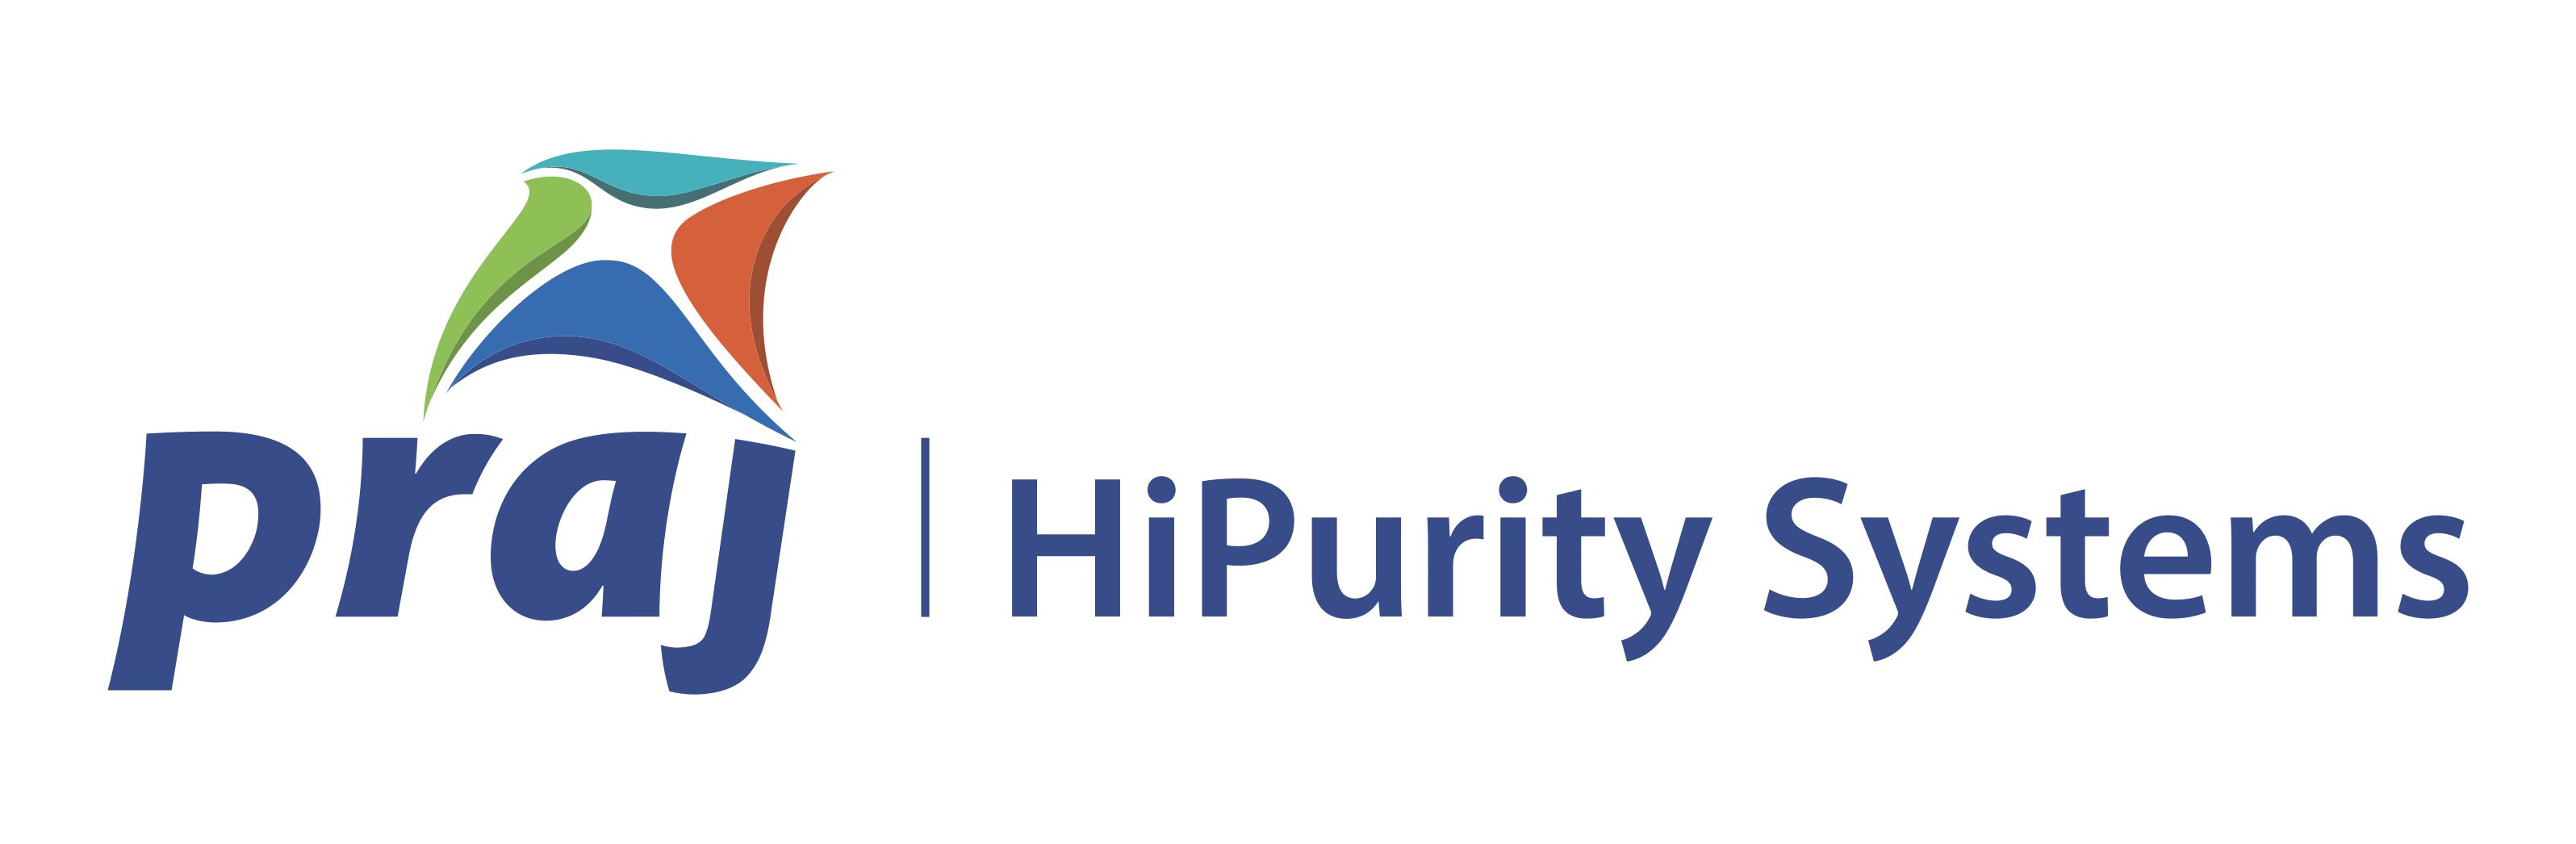 Praj Hi-Purity Systems